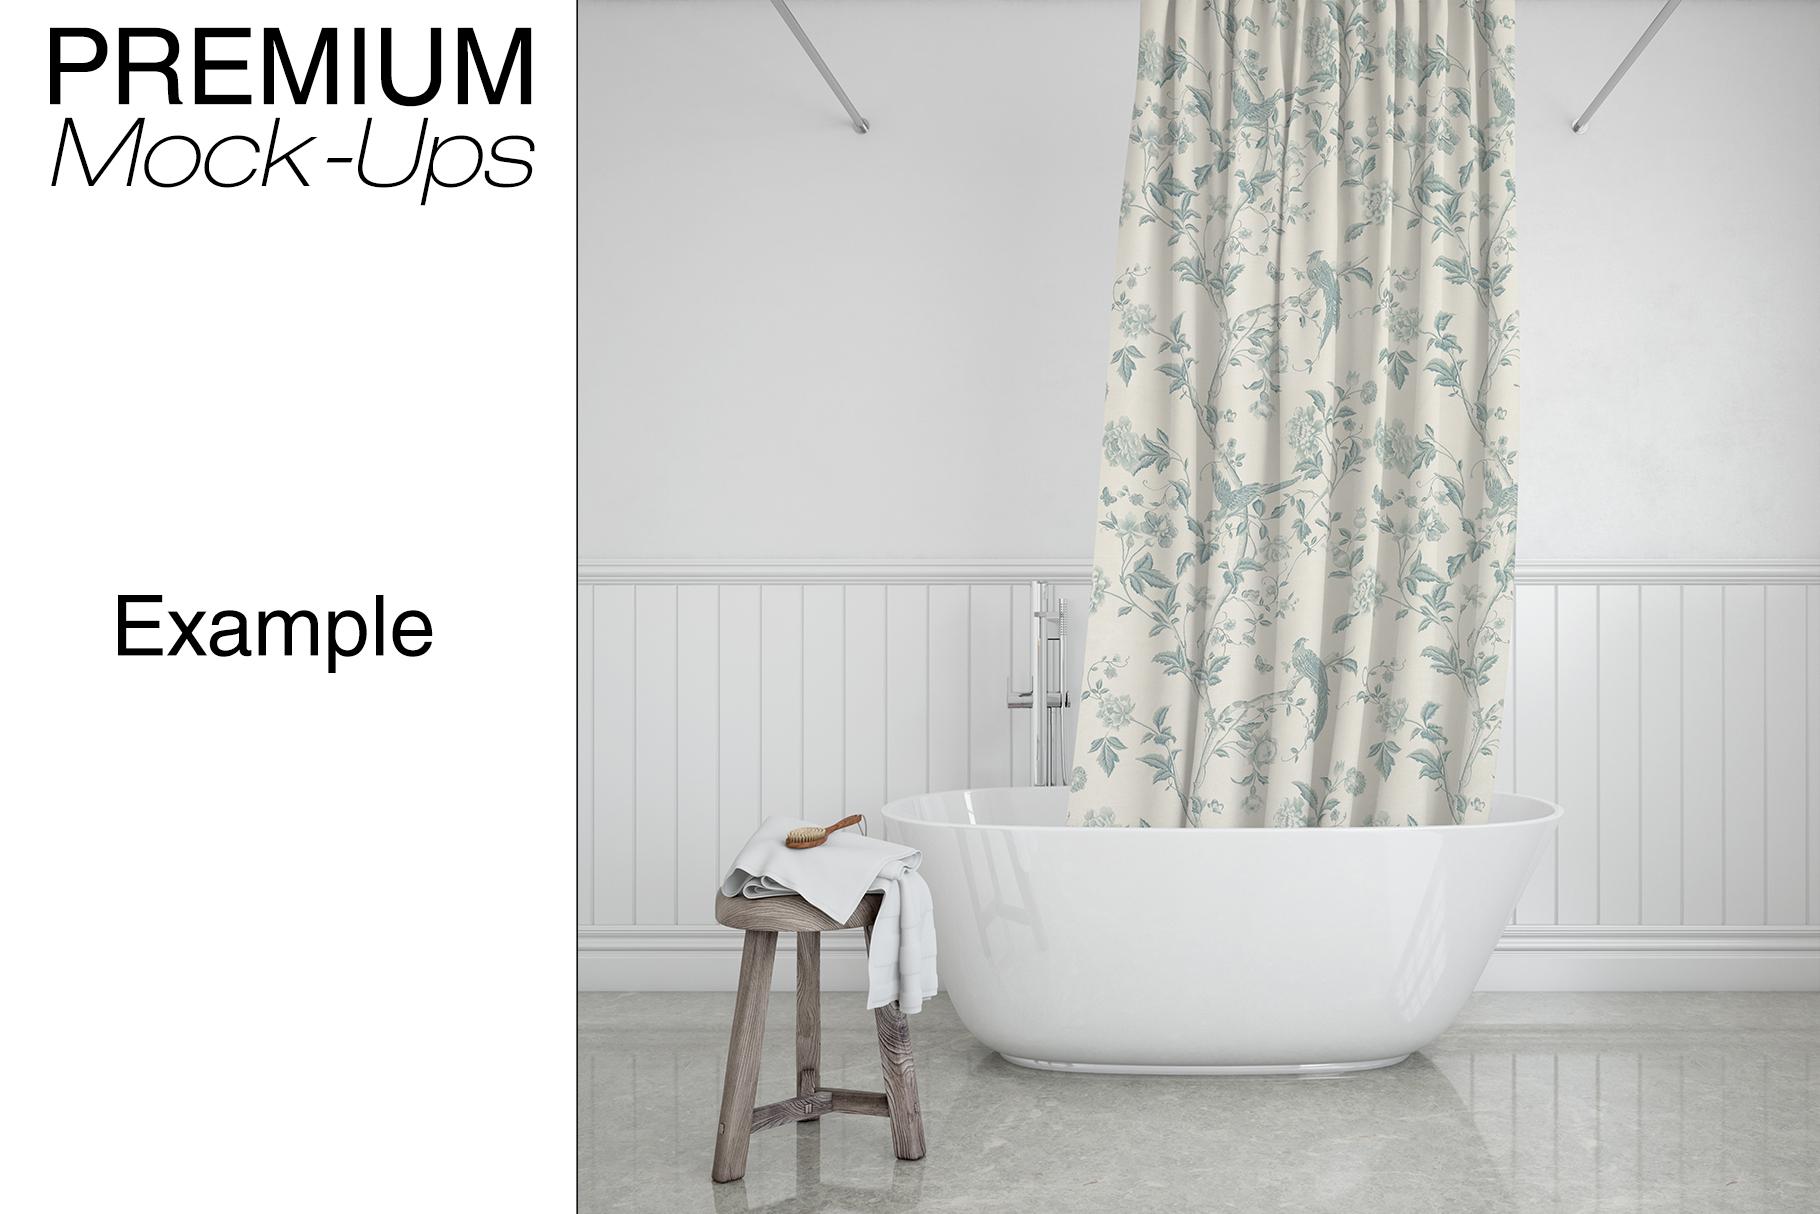 Bath Curtain Mockup Pack example image 4